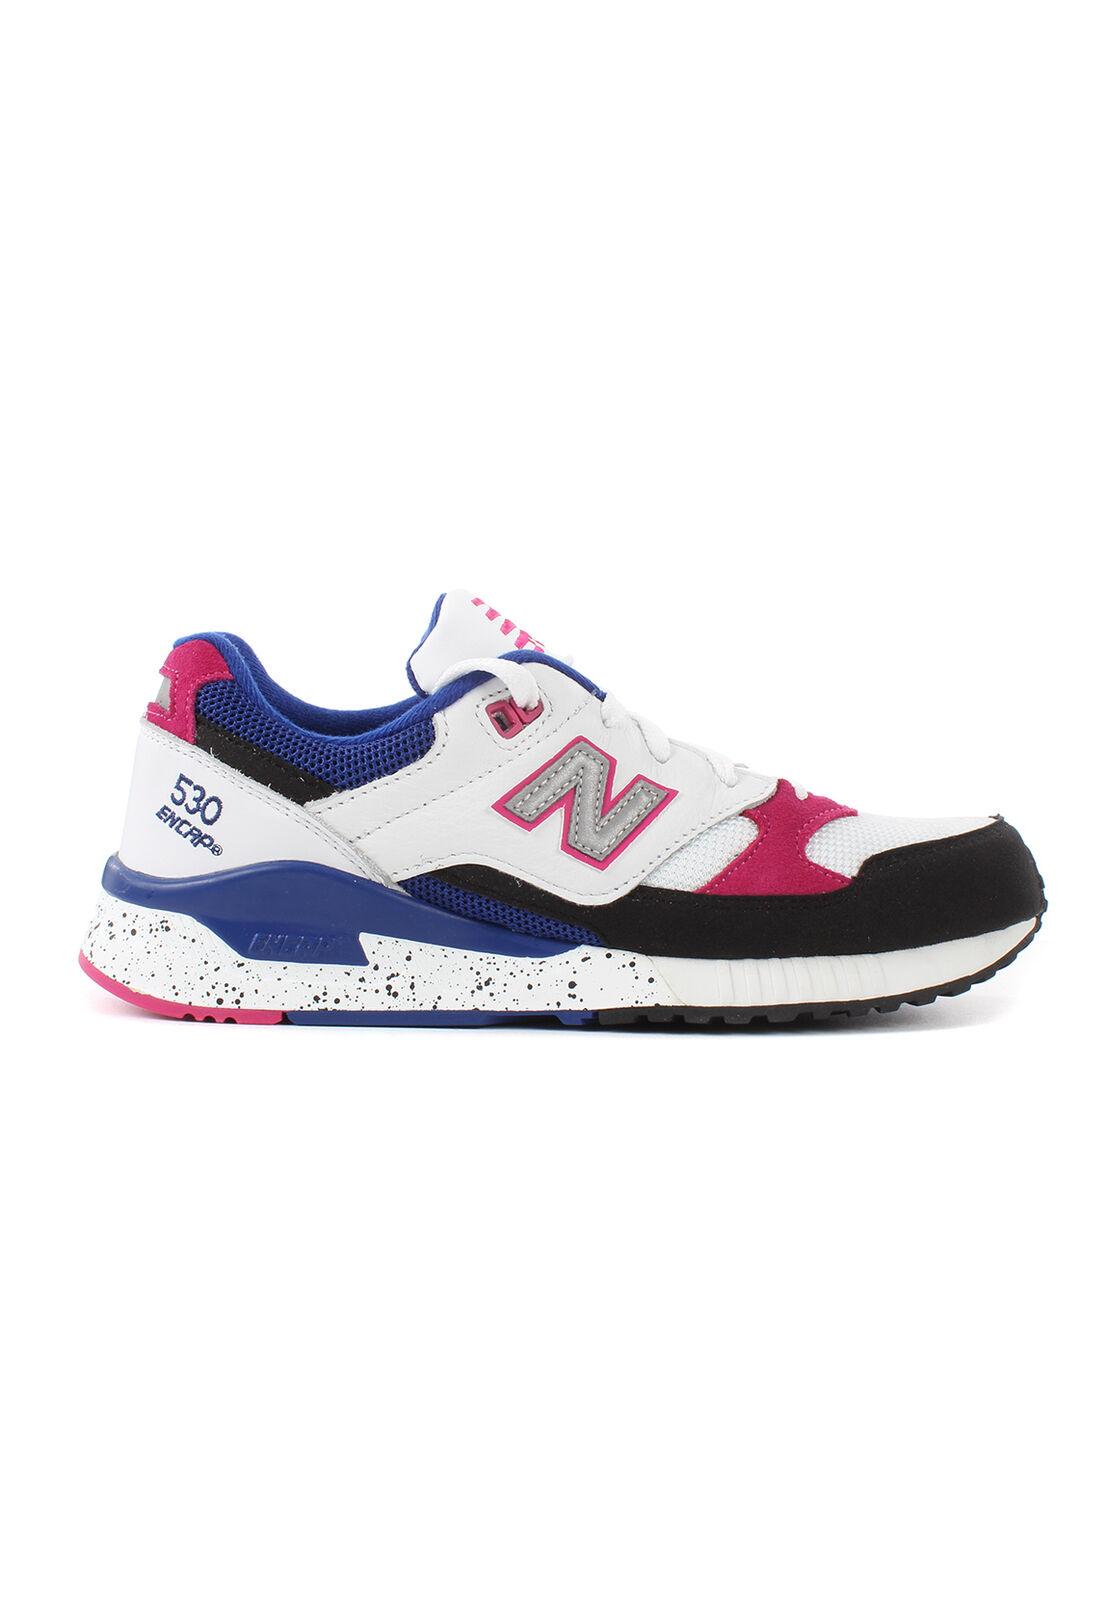 New Balance Women's Sneakers W530PSA Multicoloured White Pink bluee